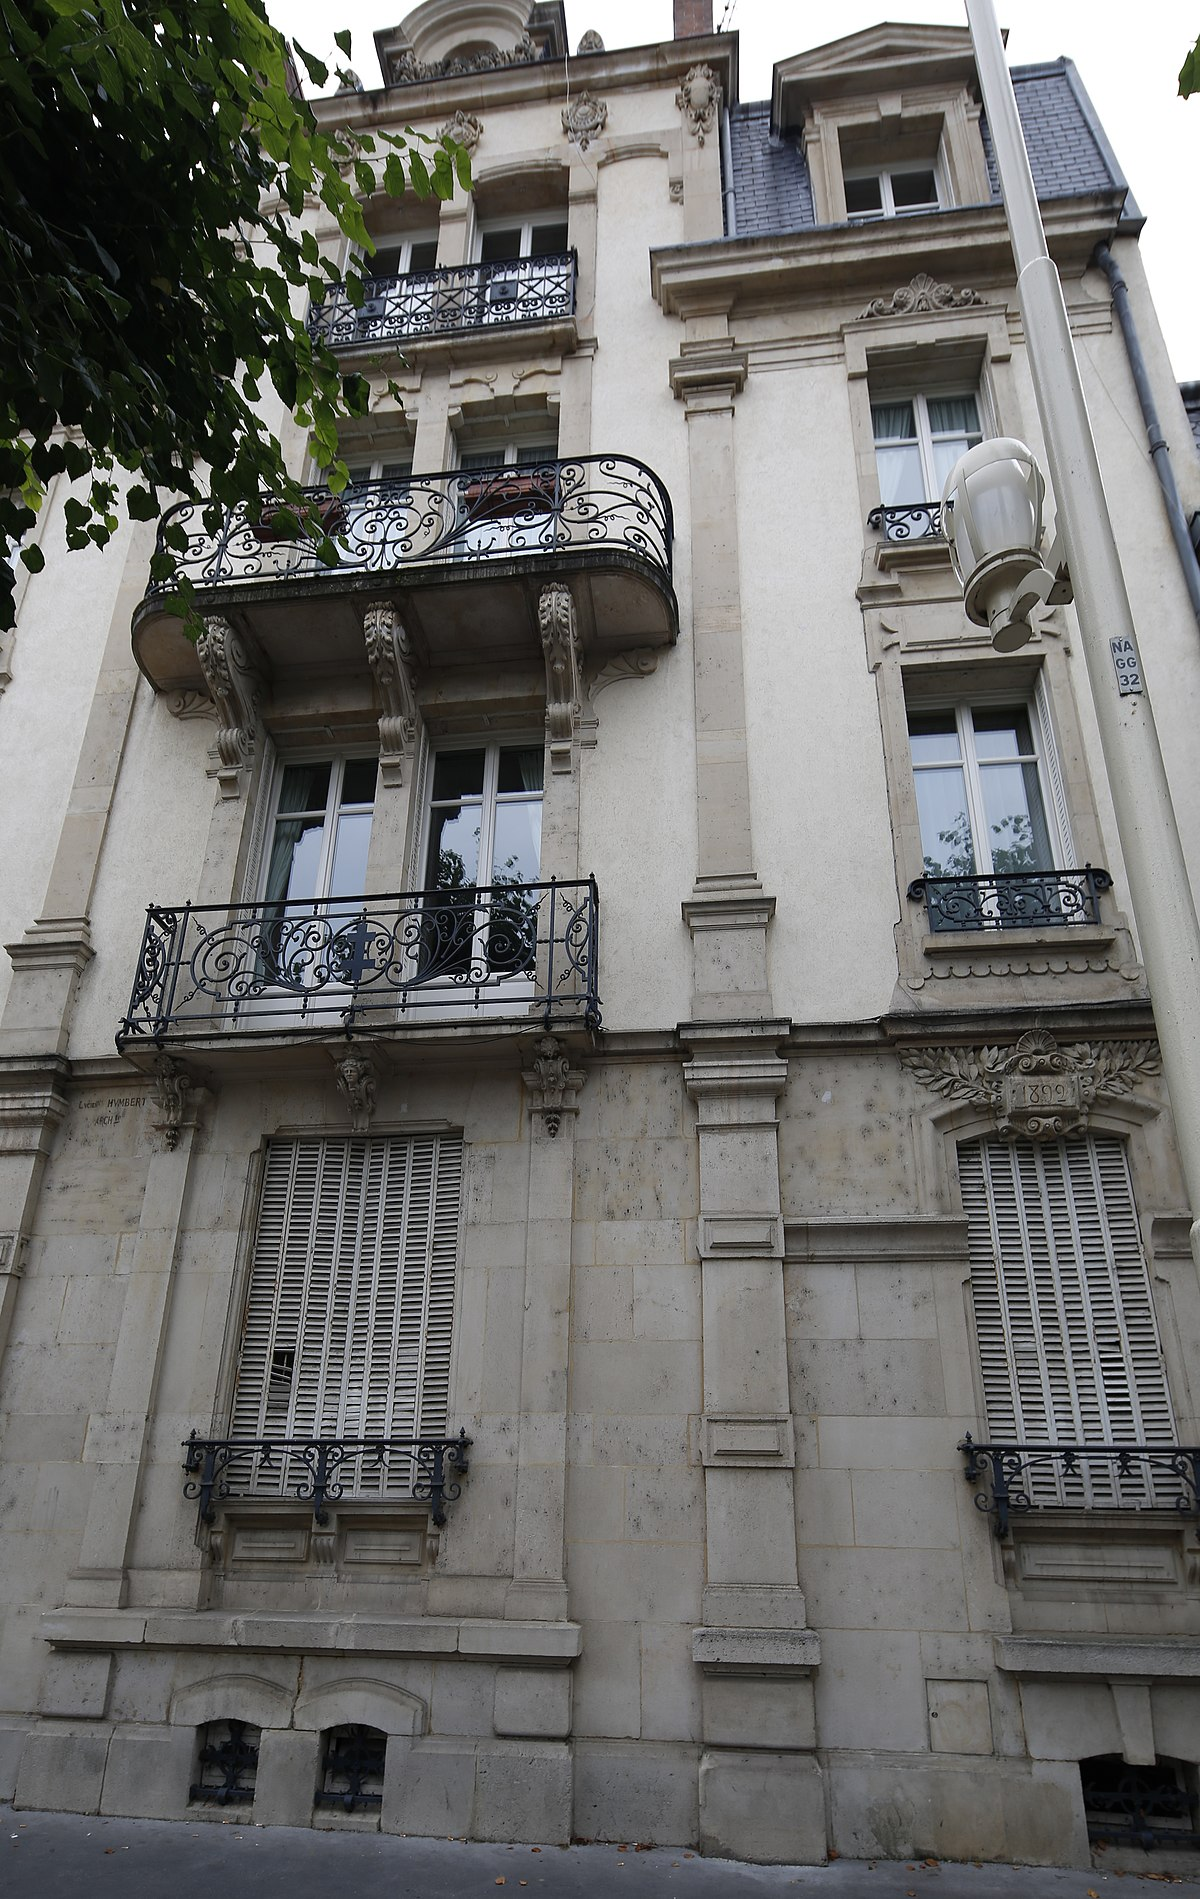 Rue grandville wikip dia for Rue catherine opalinska nancy